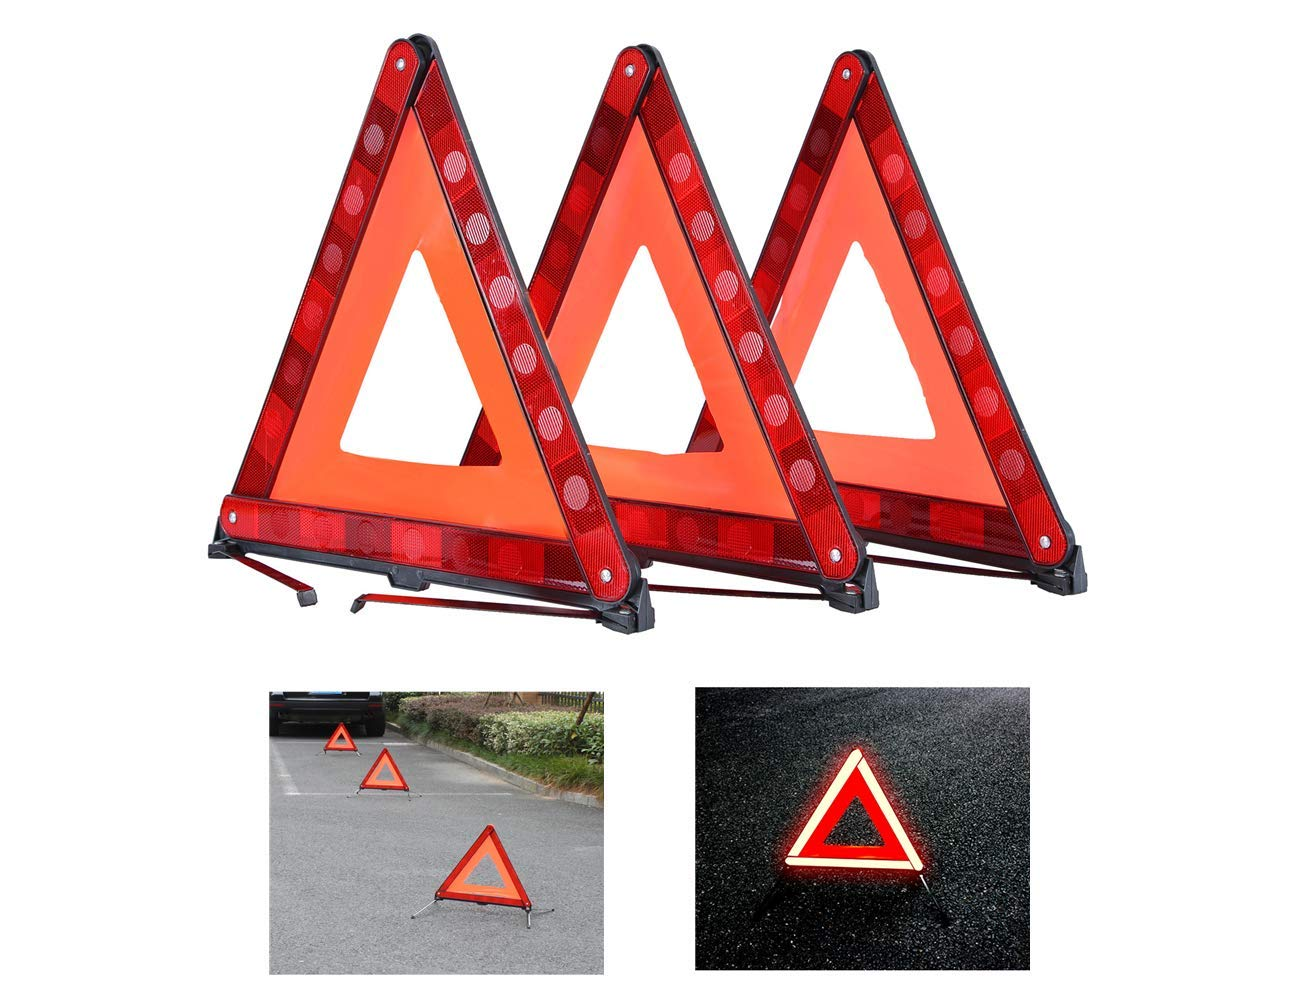 ATP Triangle Warning Frame Triangle Emergency Warning Triangle Reflector Safety Triangle Kit 3 Pack